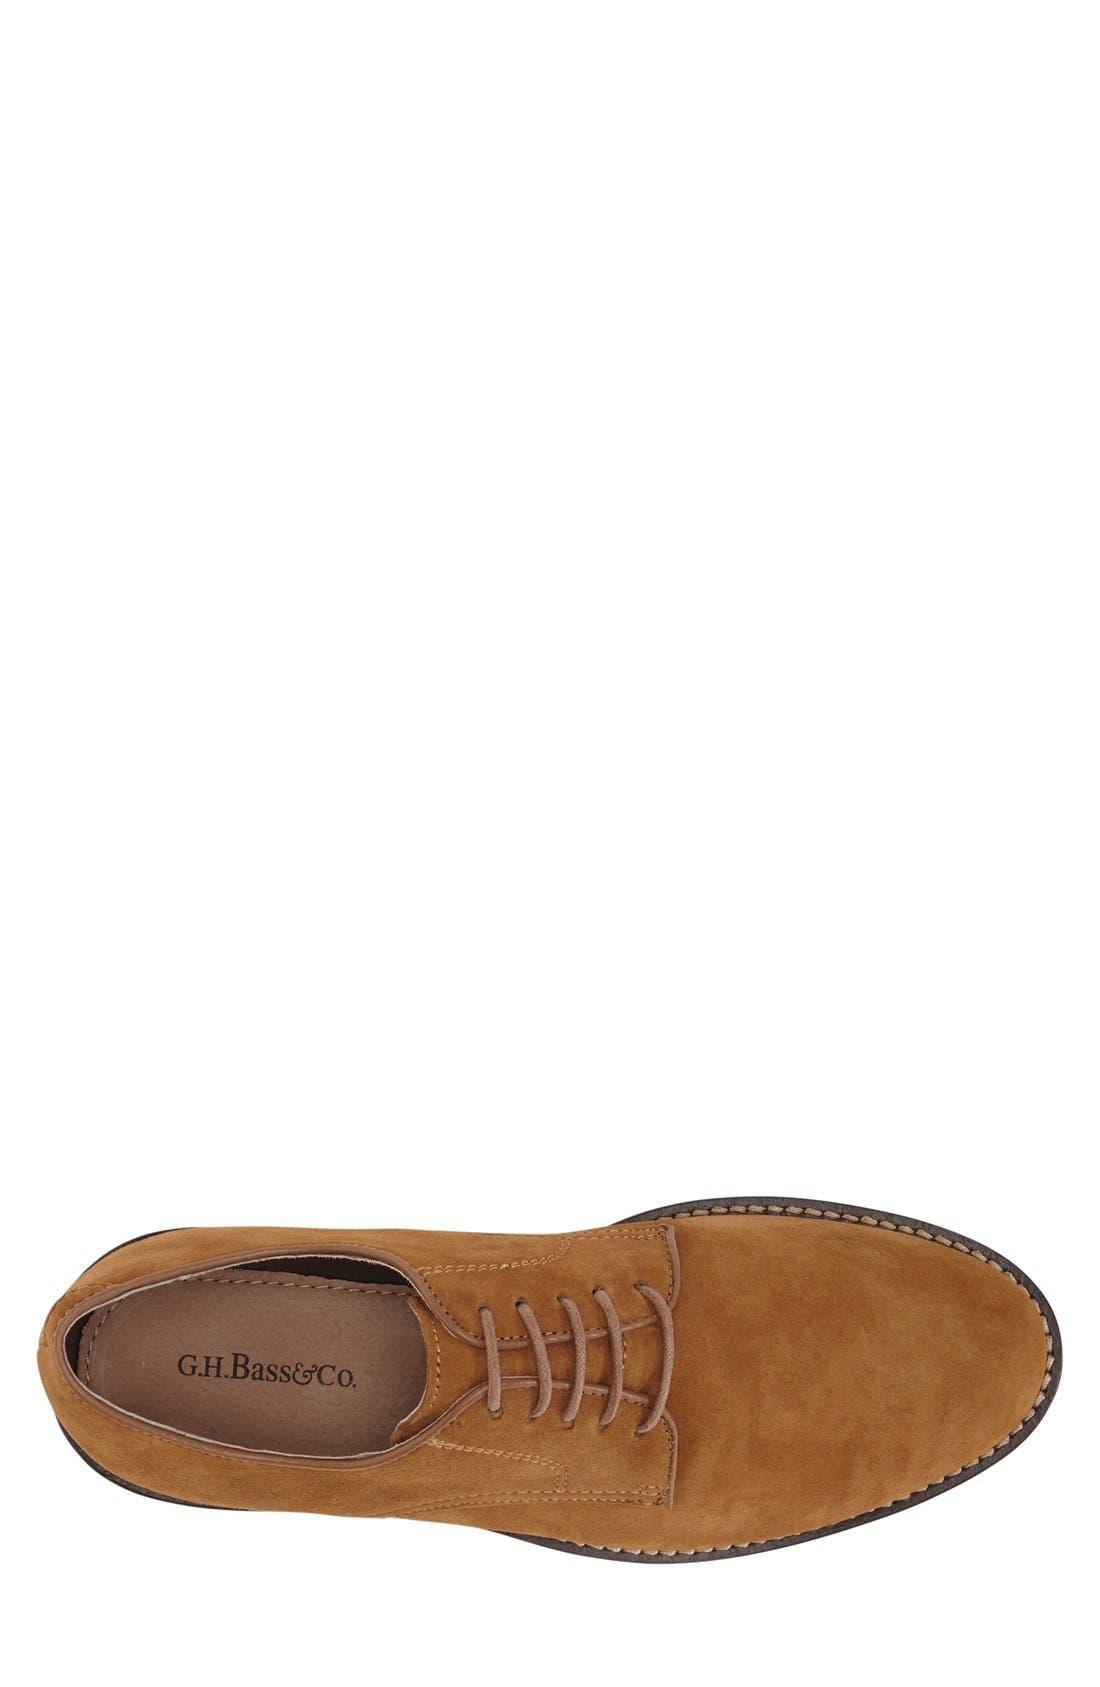 Alternate Image 3  - G.H. Bass & Co. 'Buckingham' Buck Shoe